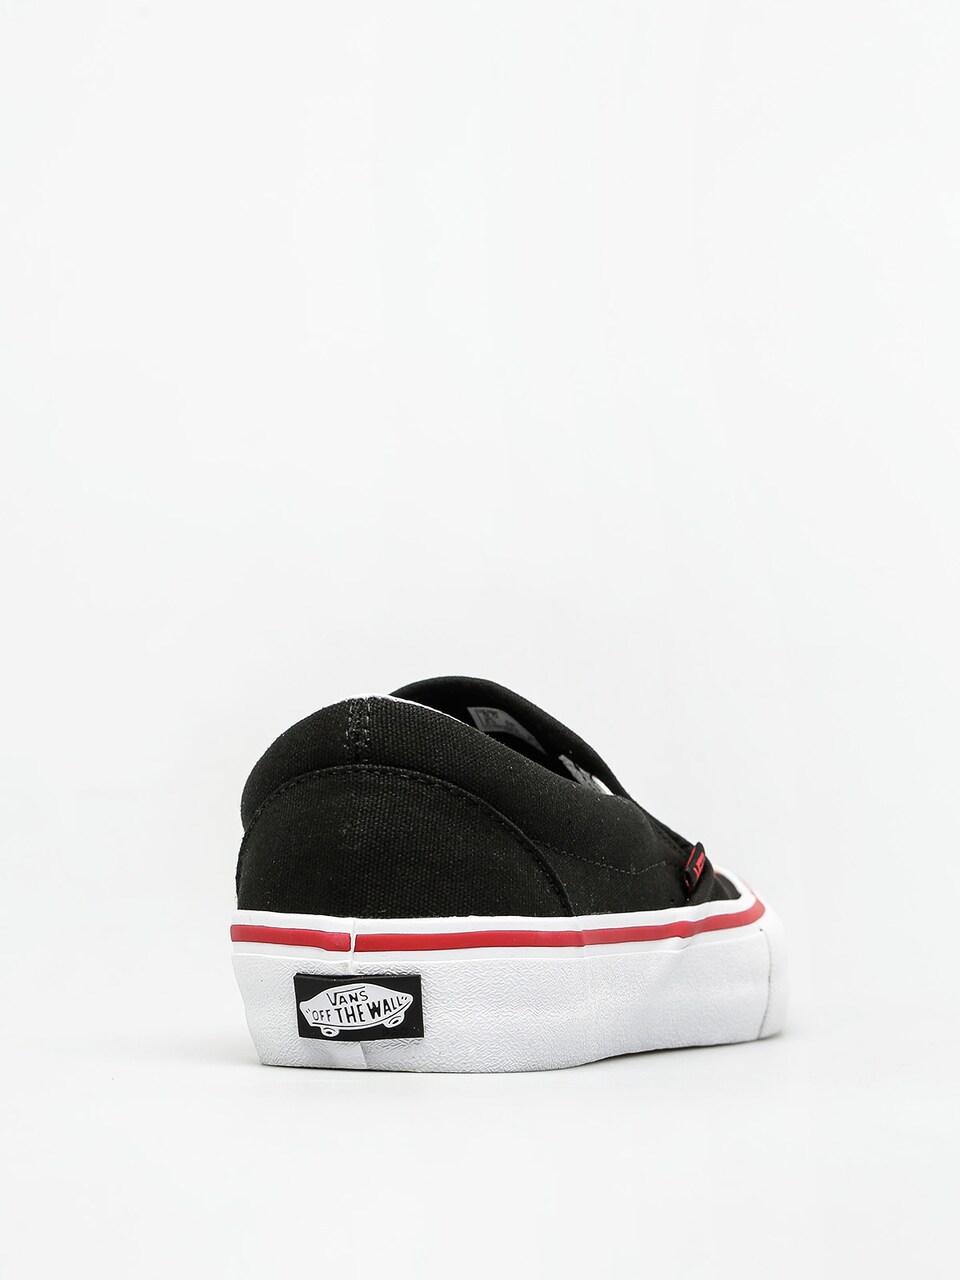 ETNIES X THRASHER Vans Shoes Slip On Pro (thrasher)